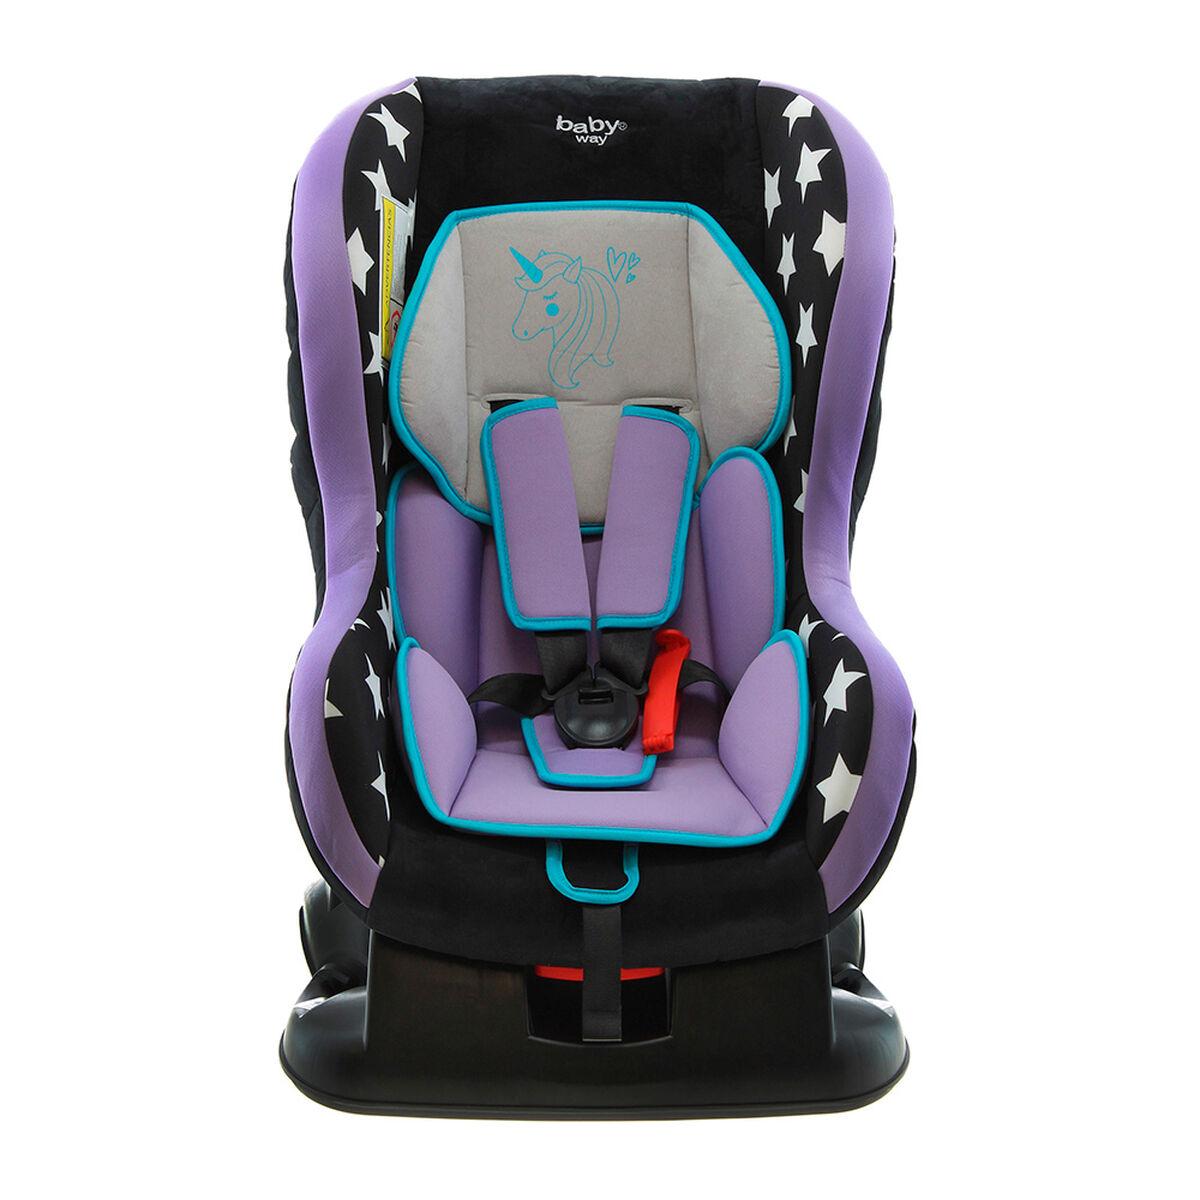 Silla para Auto Baby Way BW 743M19